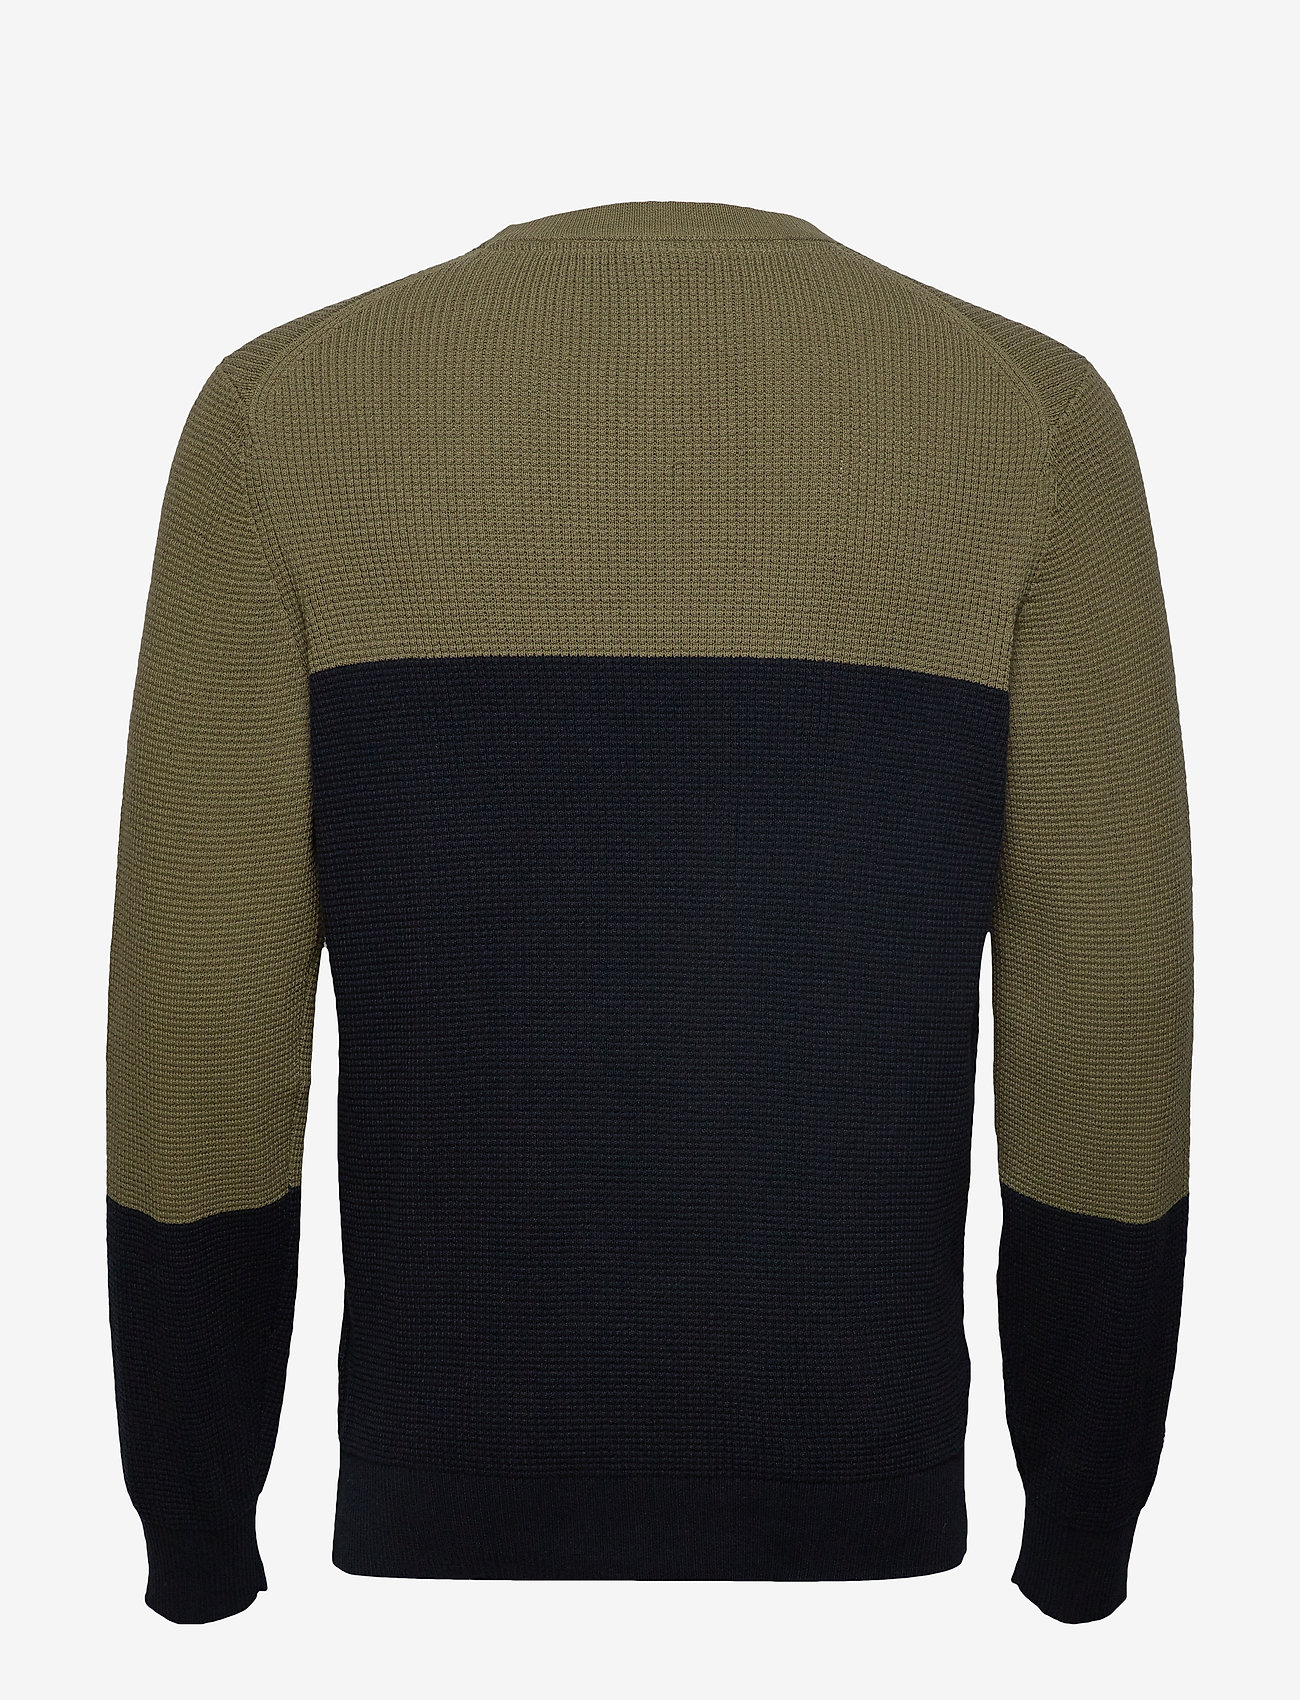 Colour Block Knitted Jumper (Dark Navy) - Lyle & Scott Bx7TEe